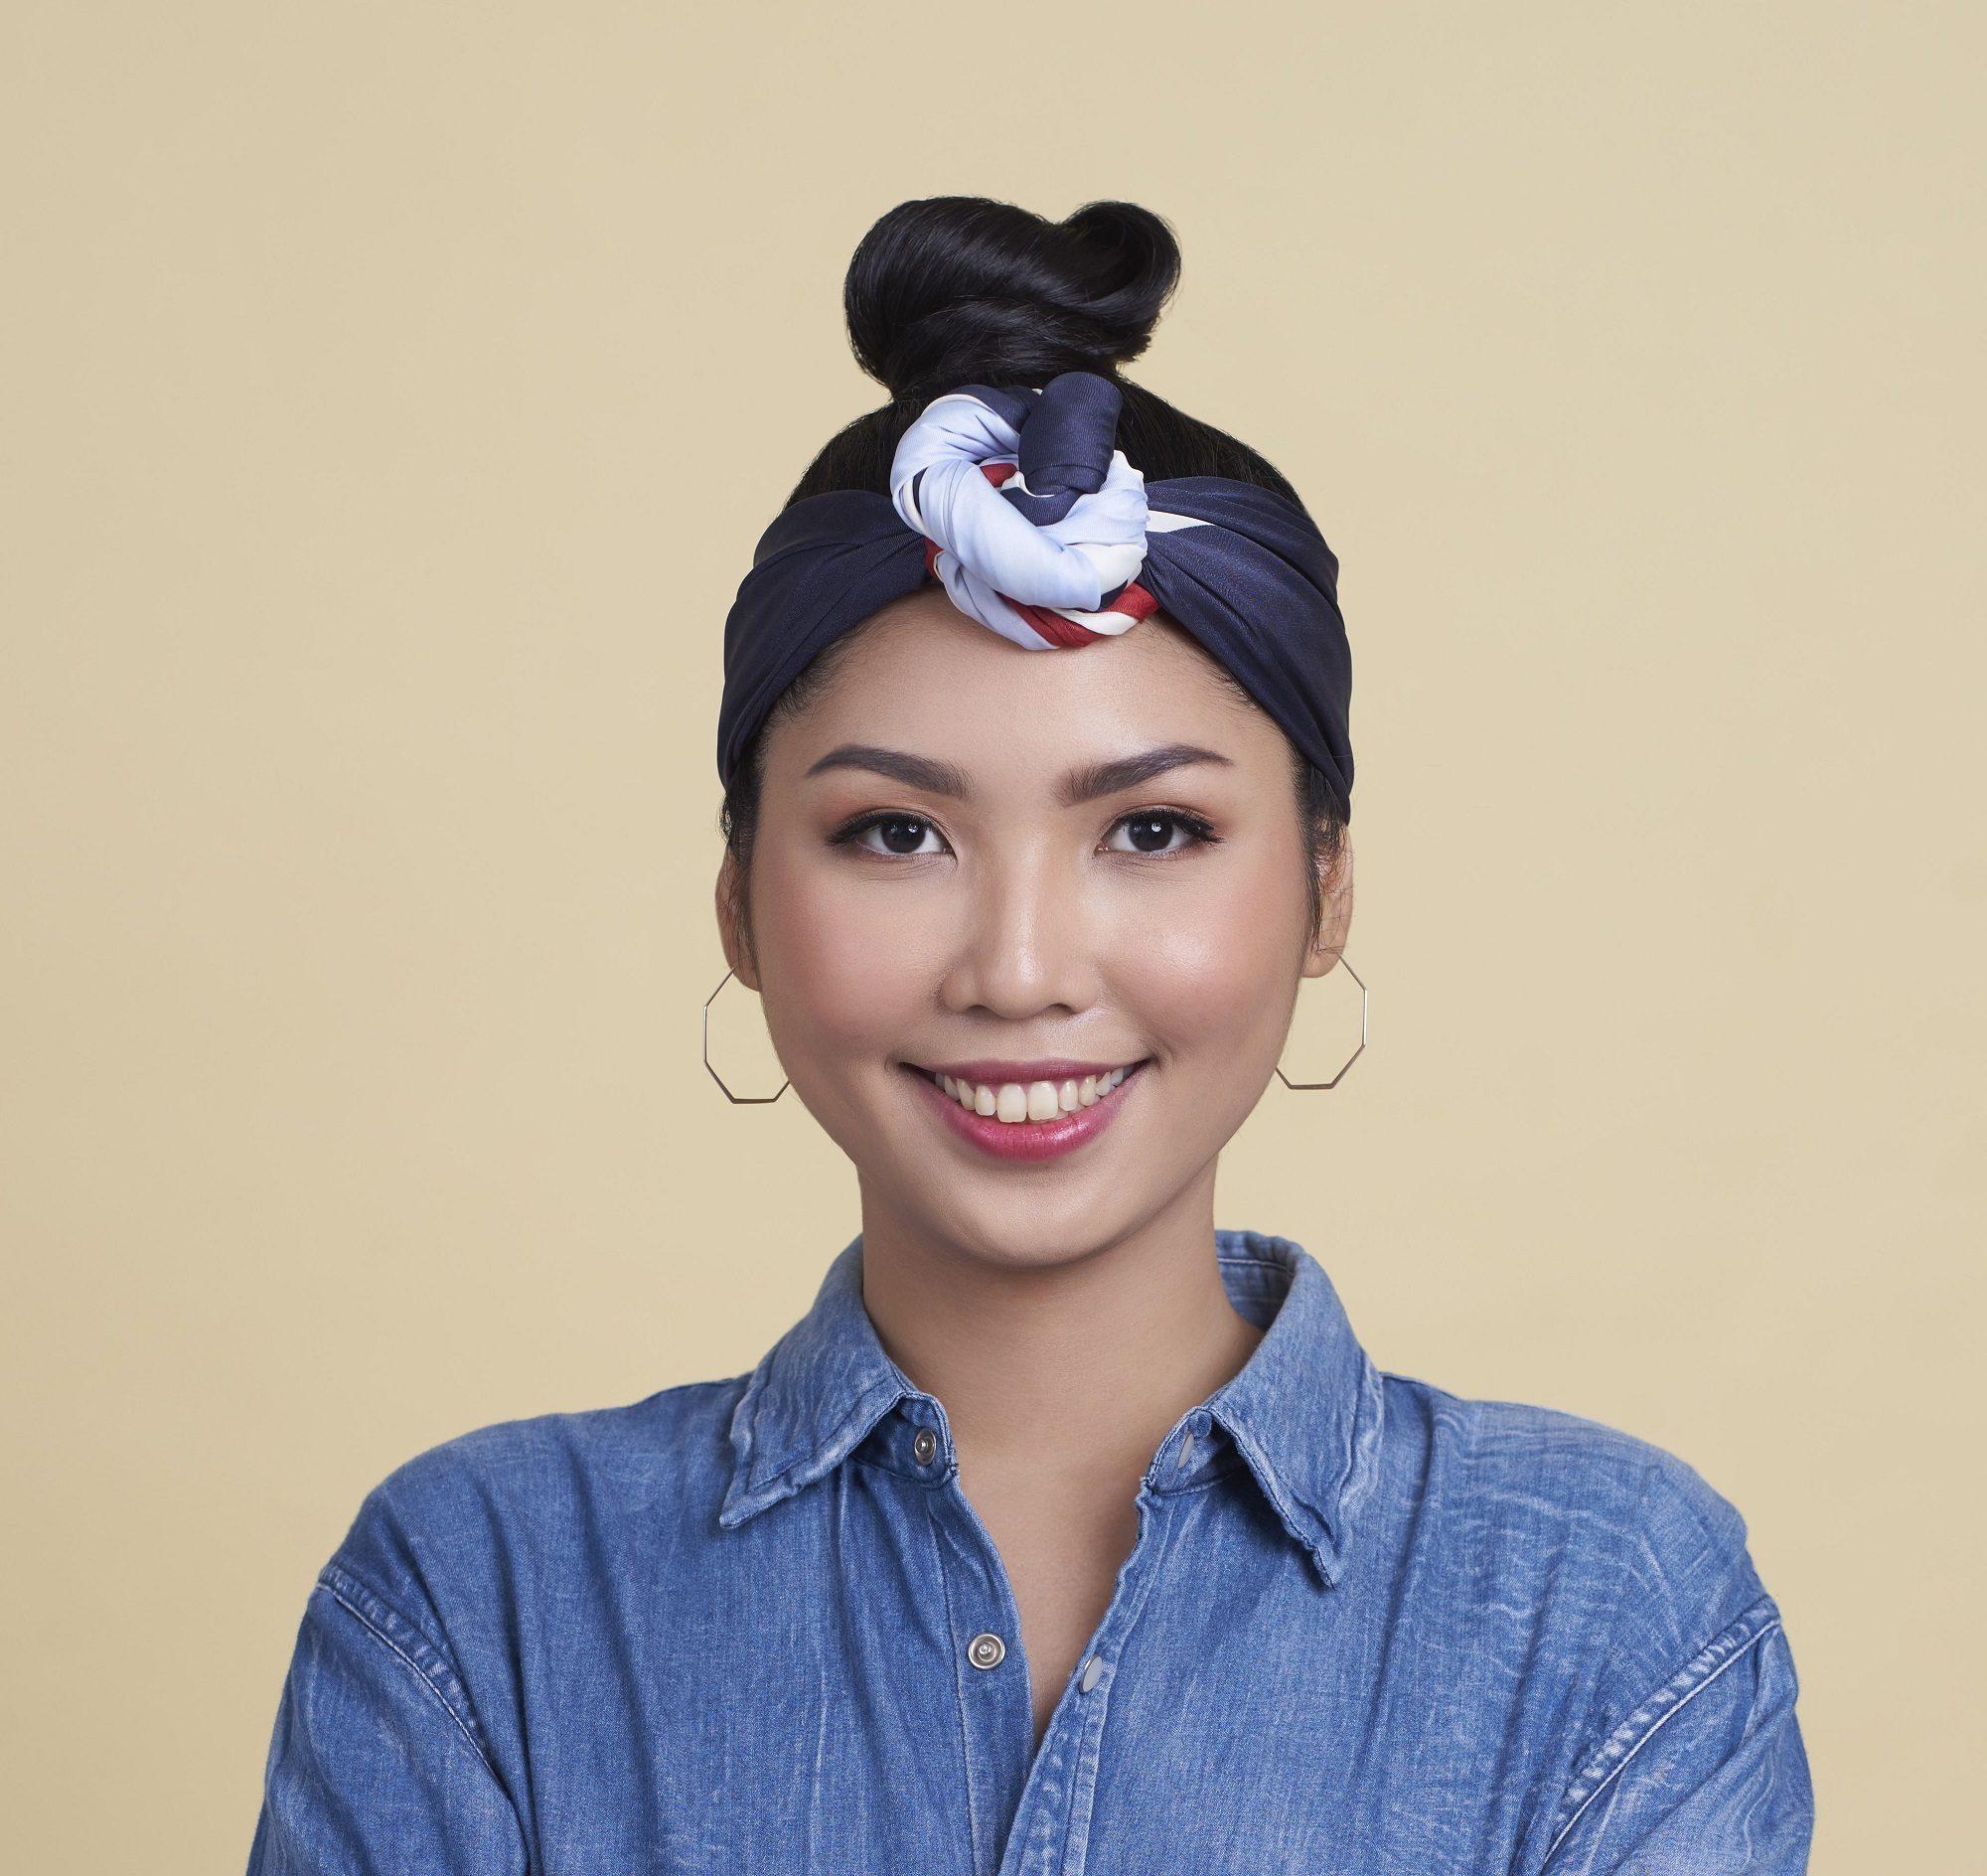 Oily hair: Closeup shot of an Asian woman with black hair in a top bun with headband